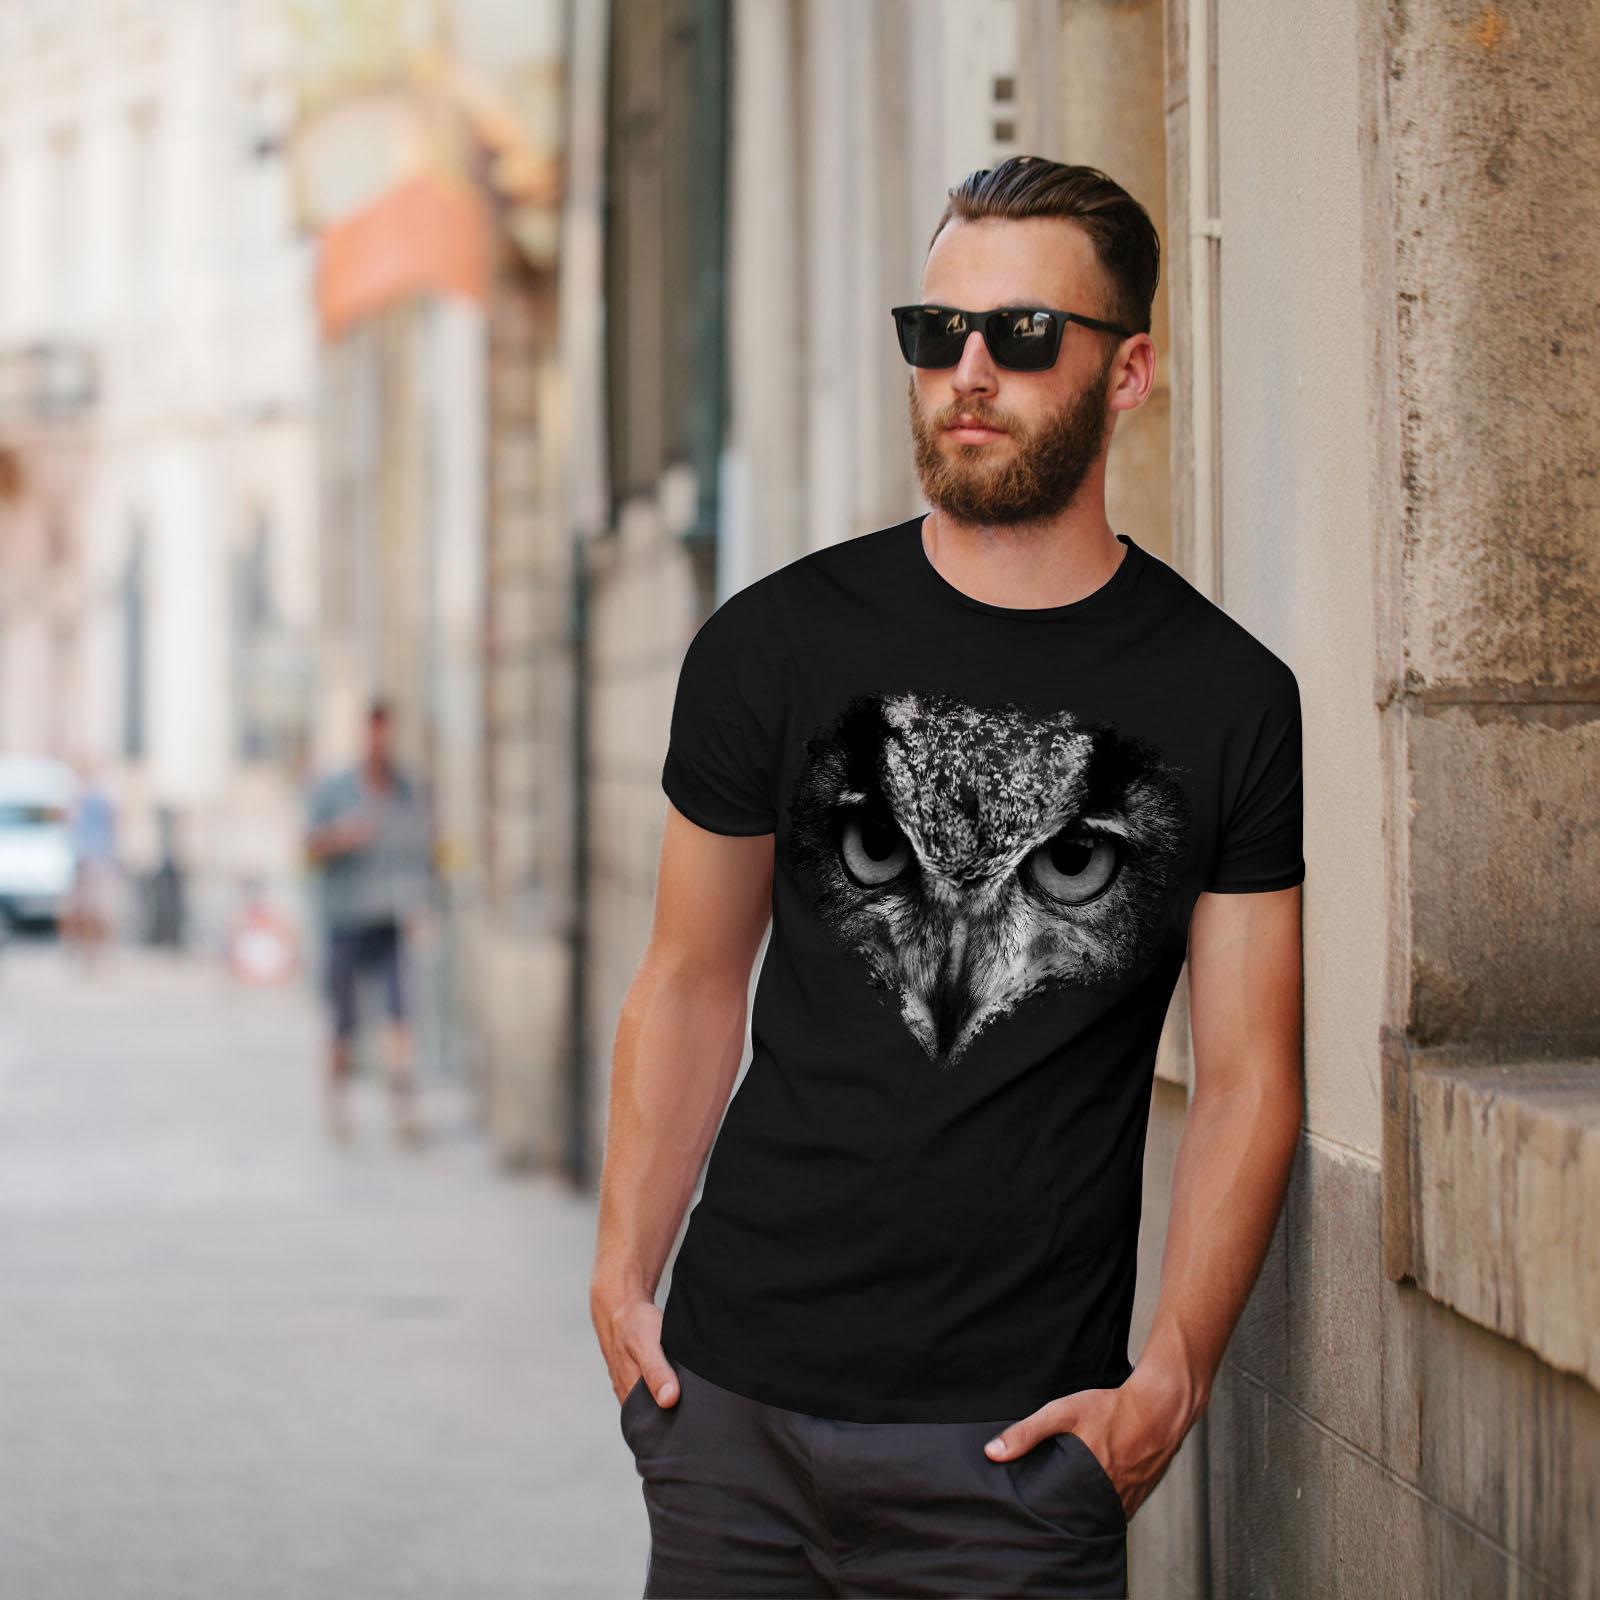 Wellcoda Owl Look Eye Cute Animal Mens T-shirt Bird Graphic Design Printed Tee